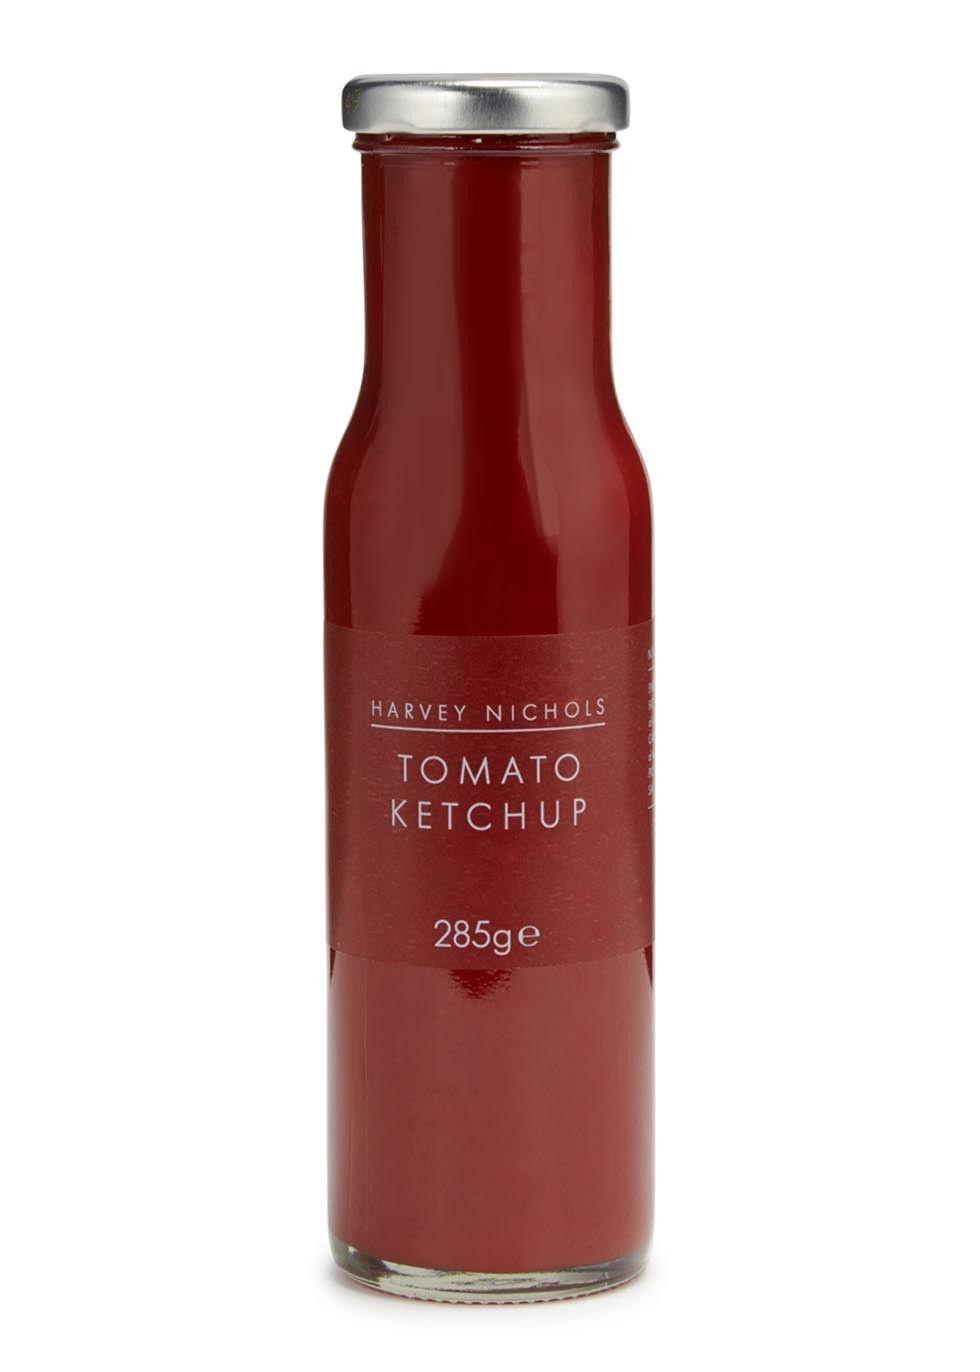 Harvey Nichols Tomato Ketchup 285g 1994734